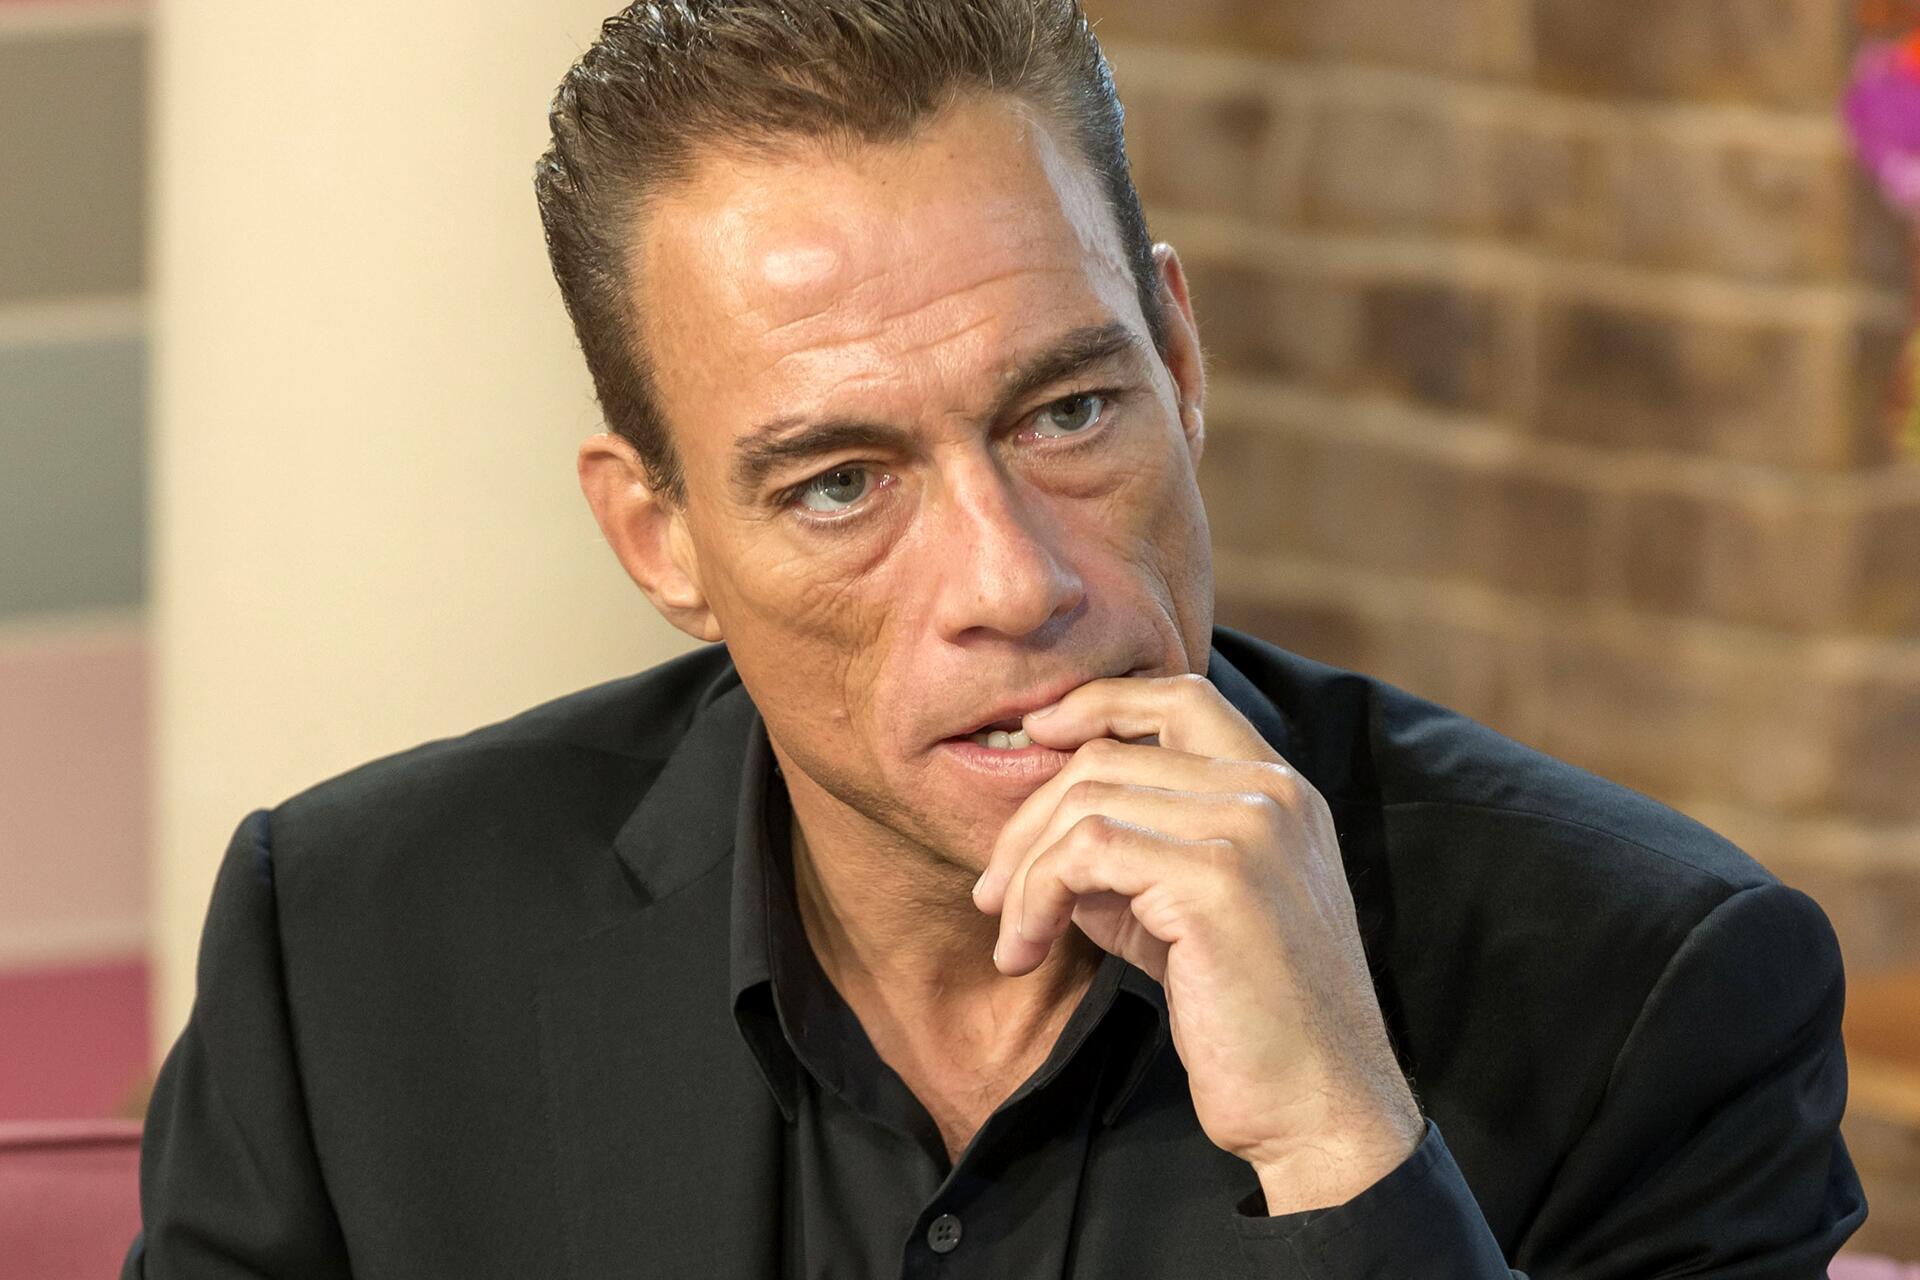 Jean Claude Van Damme High Definition Wallpapers